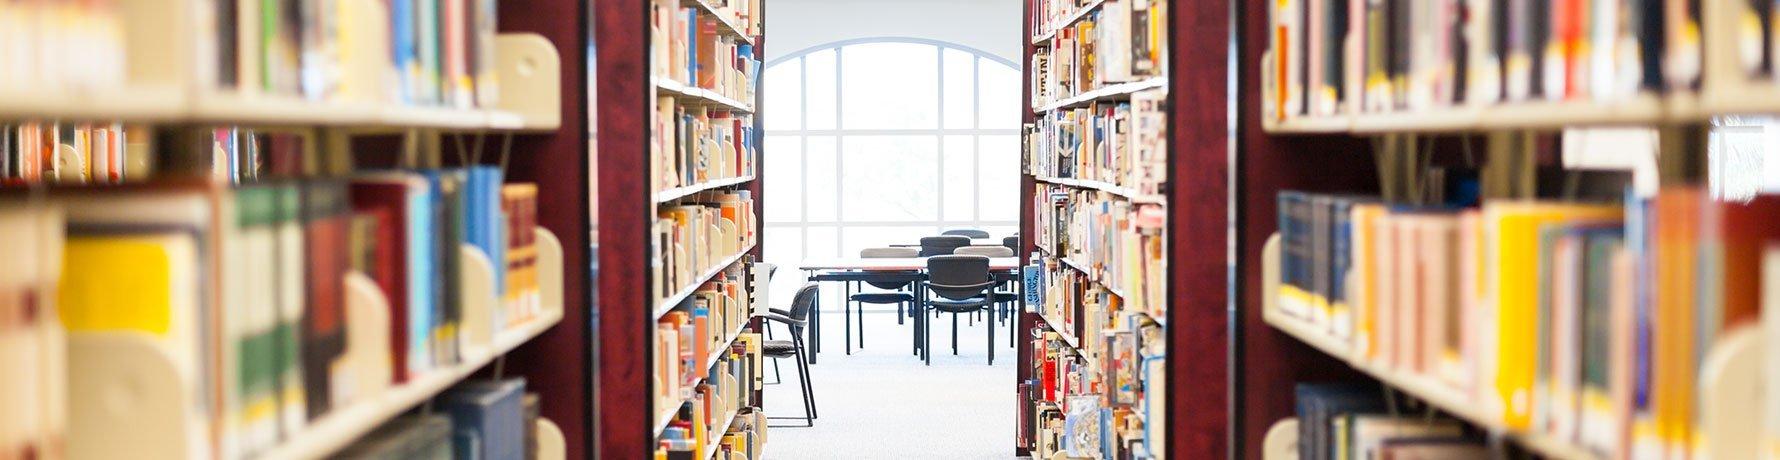 Corsi EAP - English for Academic Purposes